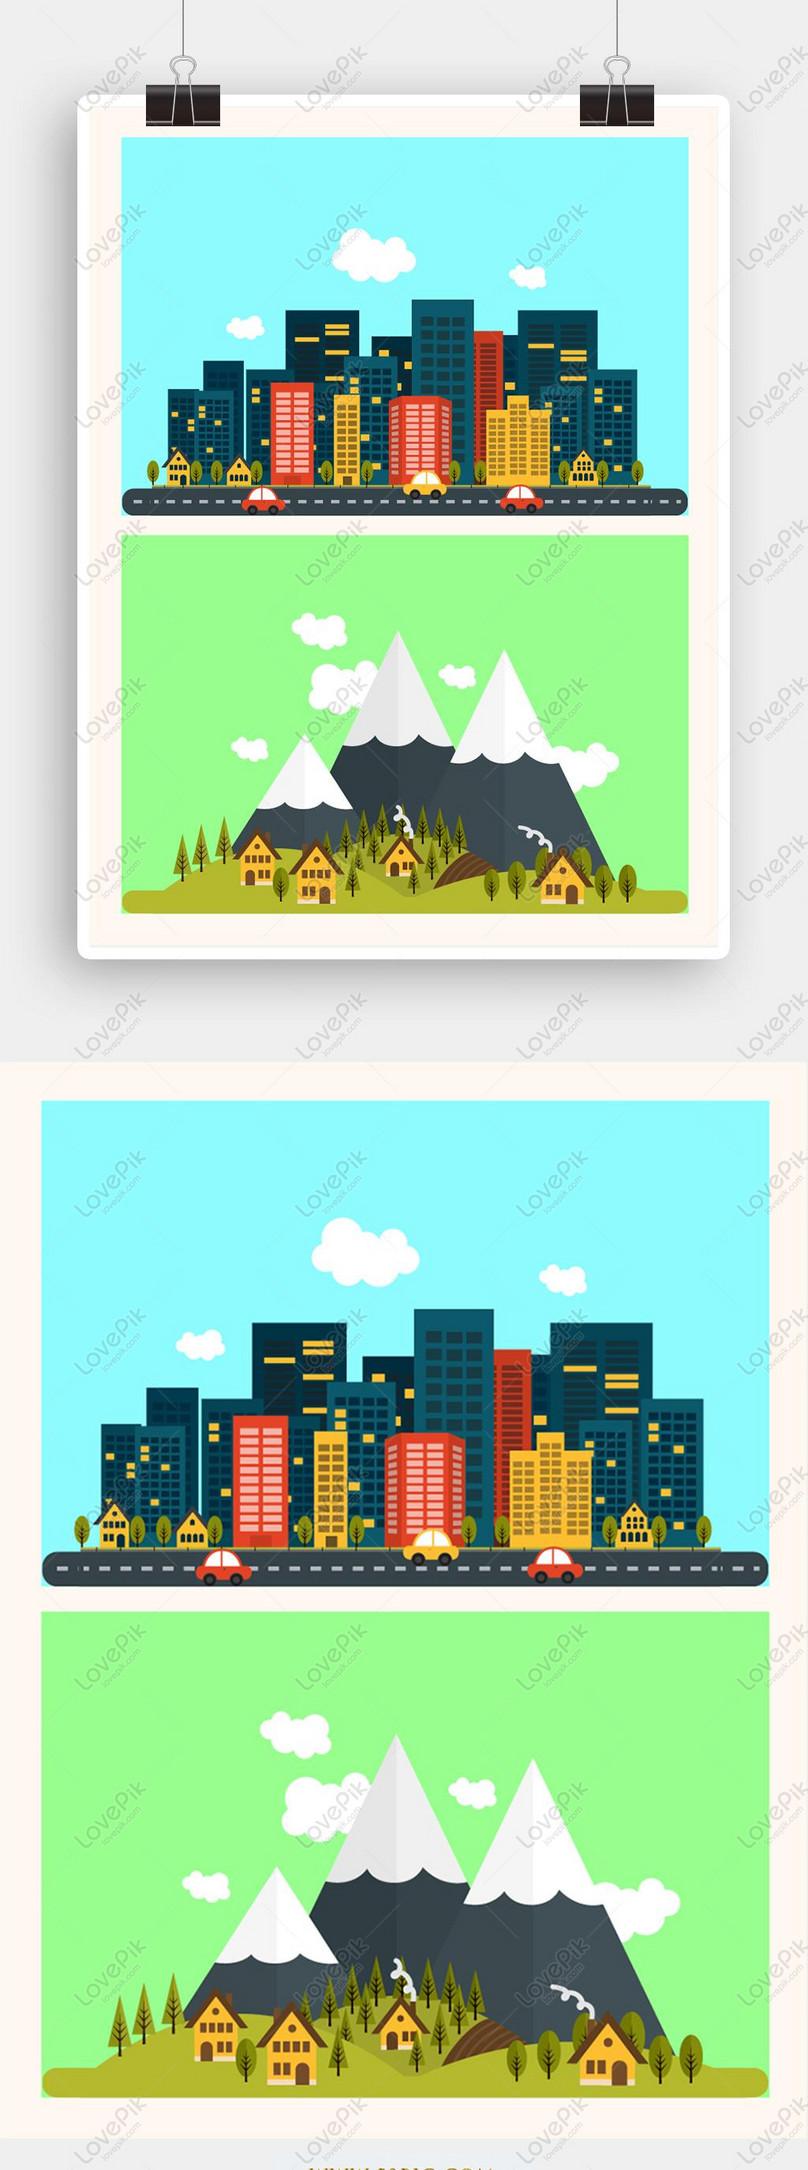 cartoon city buildings vector elements